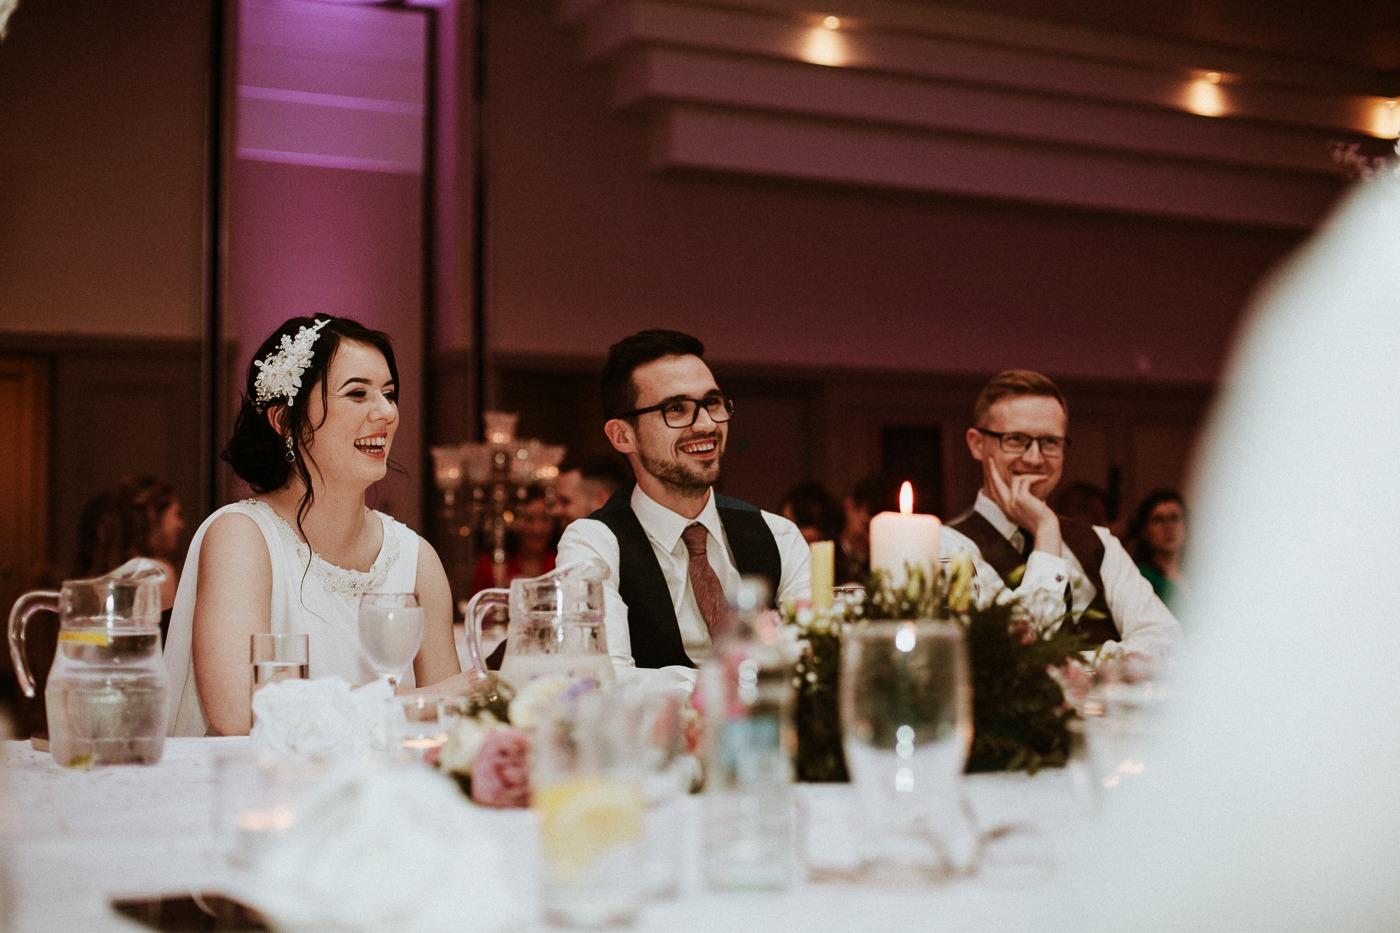 Lara St. John et al. standing around a table with wine glasses